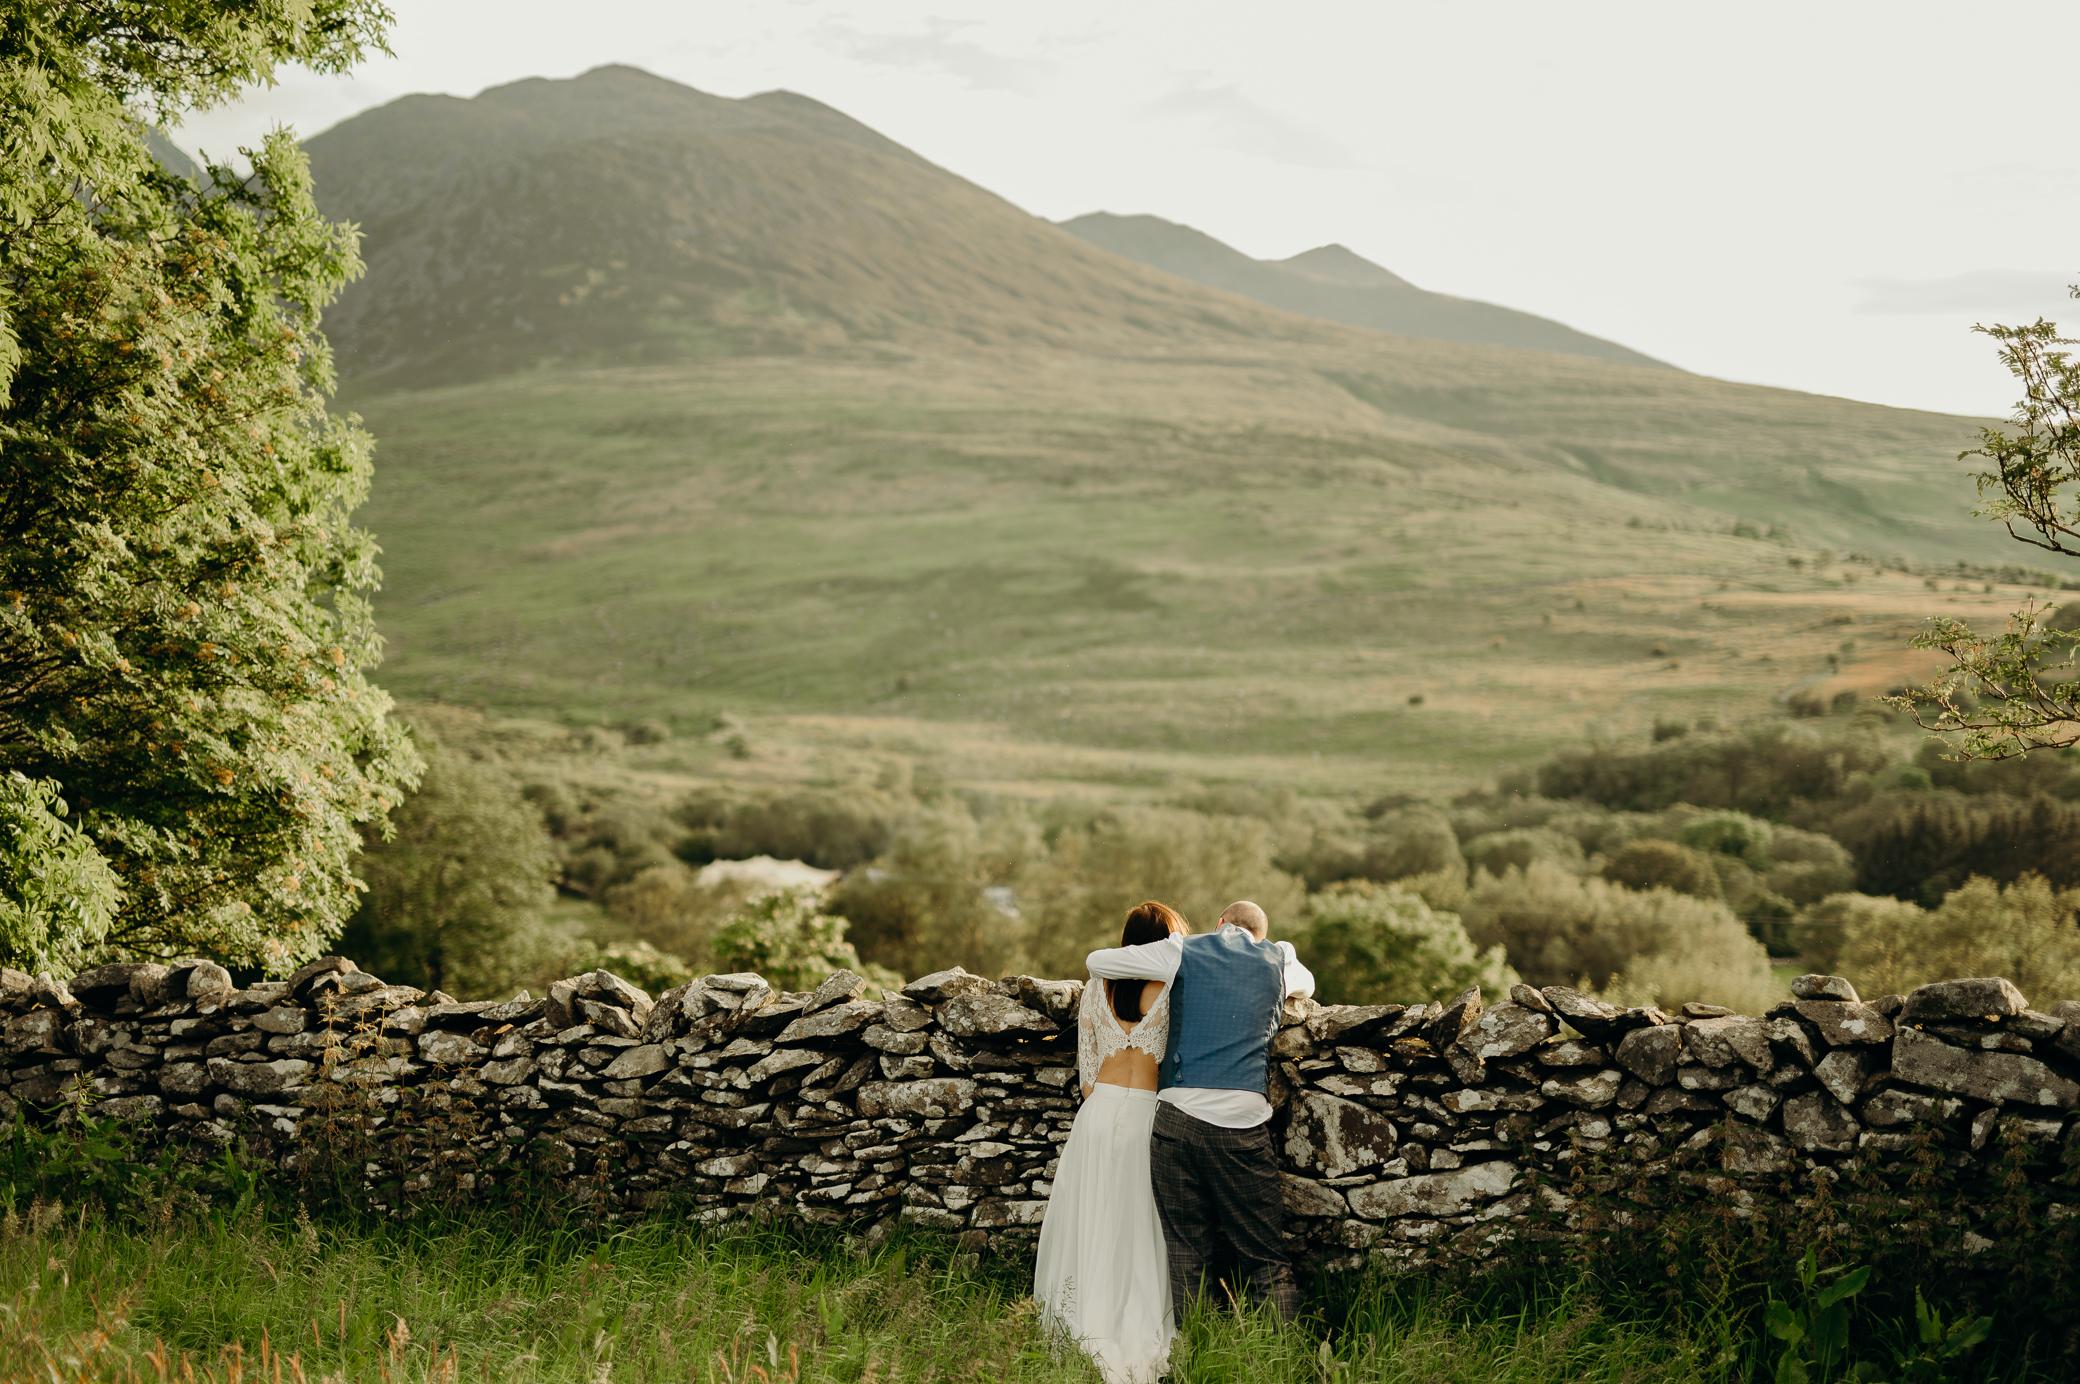 Carmel&Marcus_Wedding photographer Europe-119.jpg